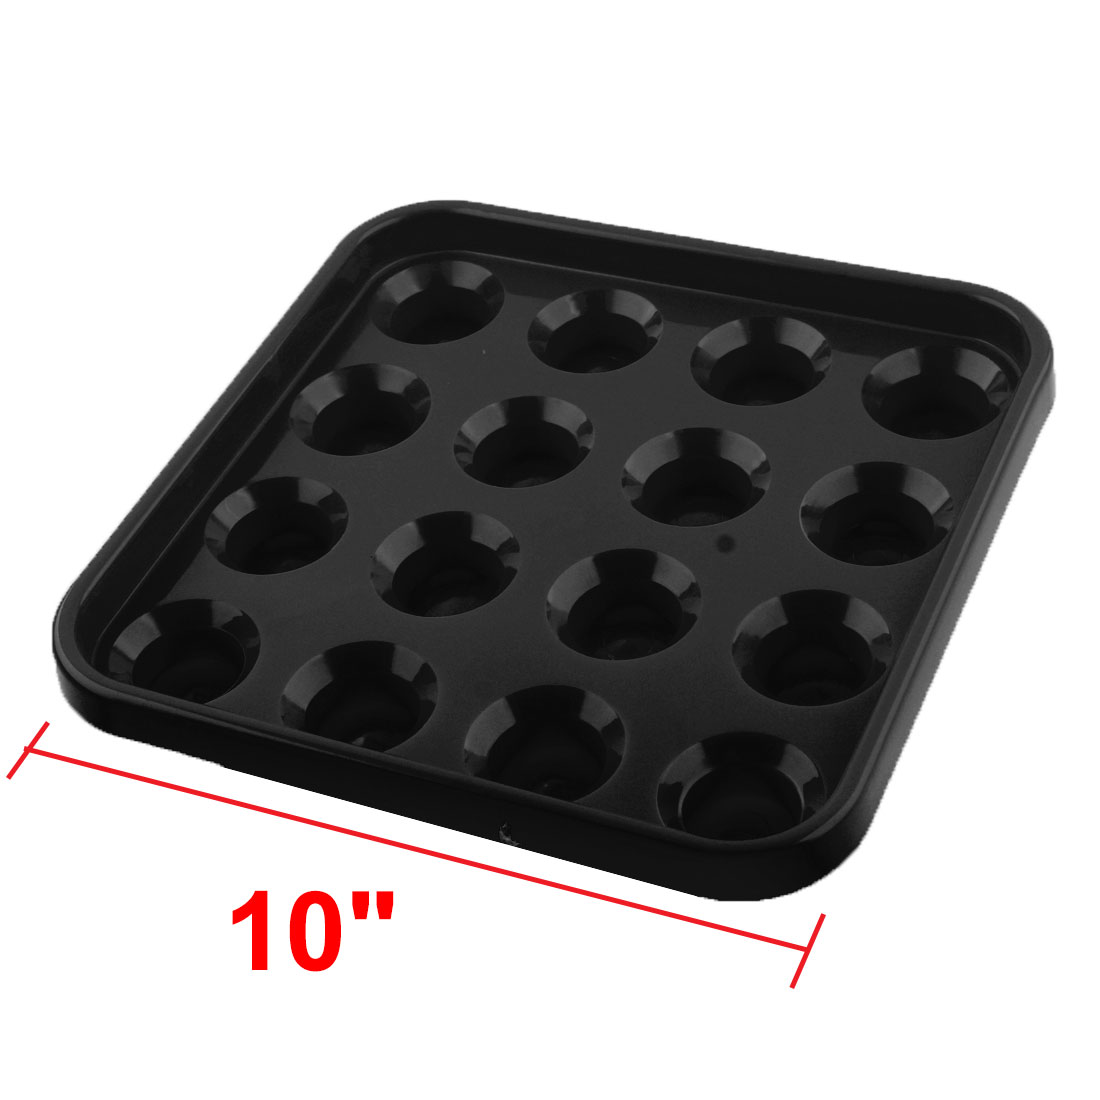 Details about  /Black Billiard Ball Tray Box Holder Case Holds 16 Balls Snooker Billilard Table